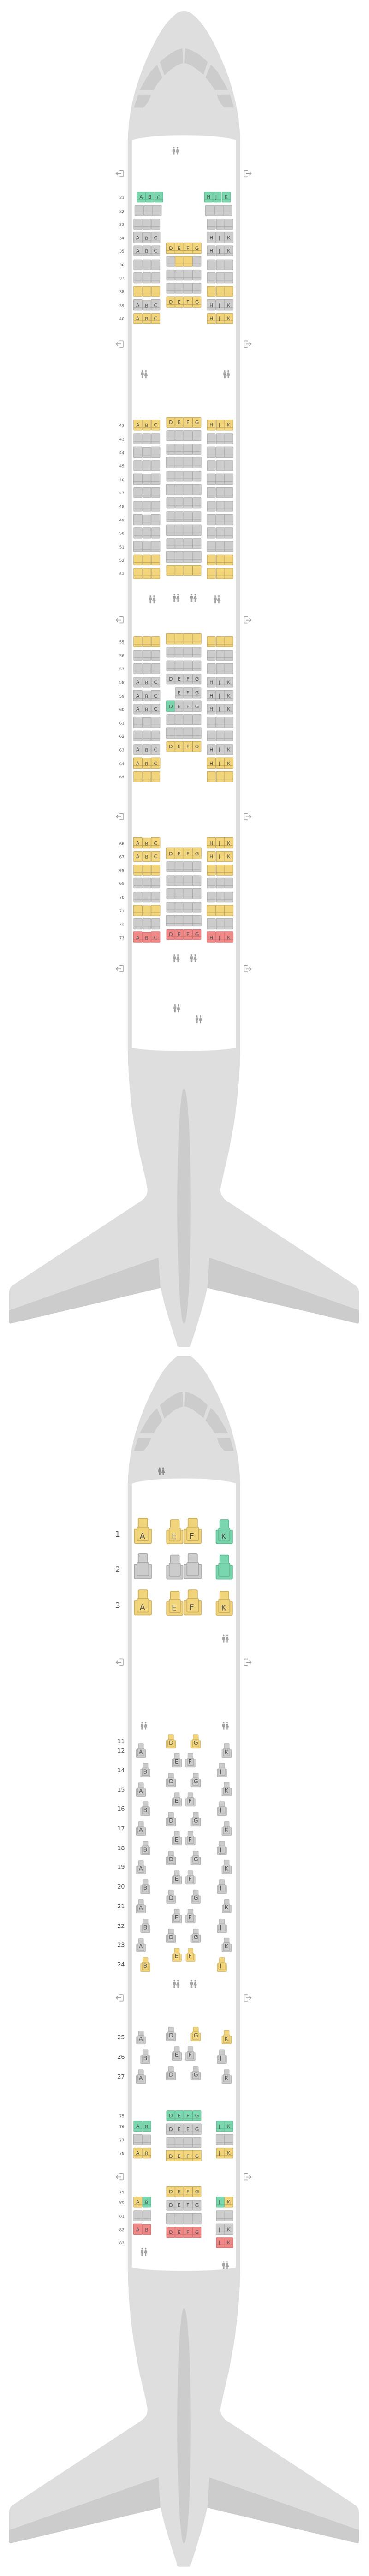 Sitzplan Airbus A380-800 (388) Thai Airways